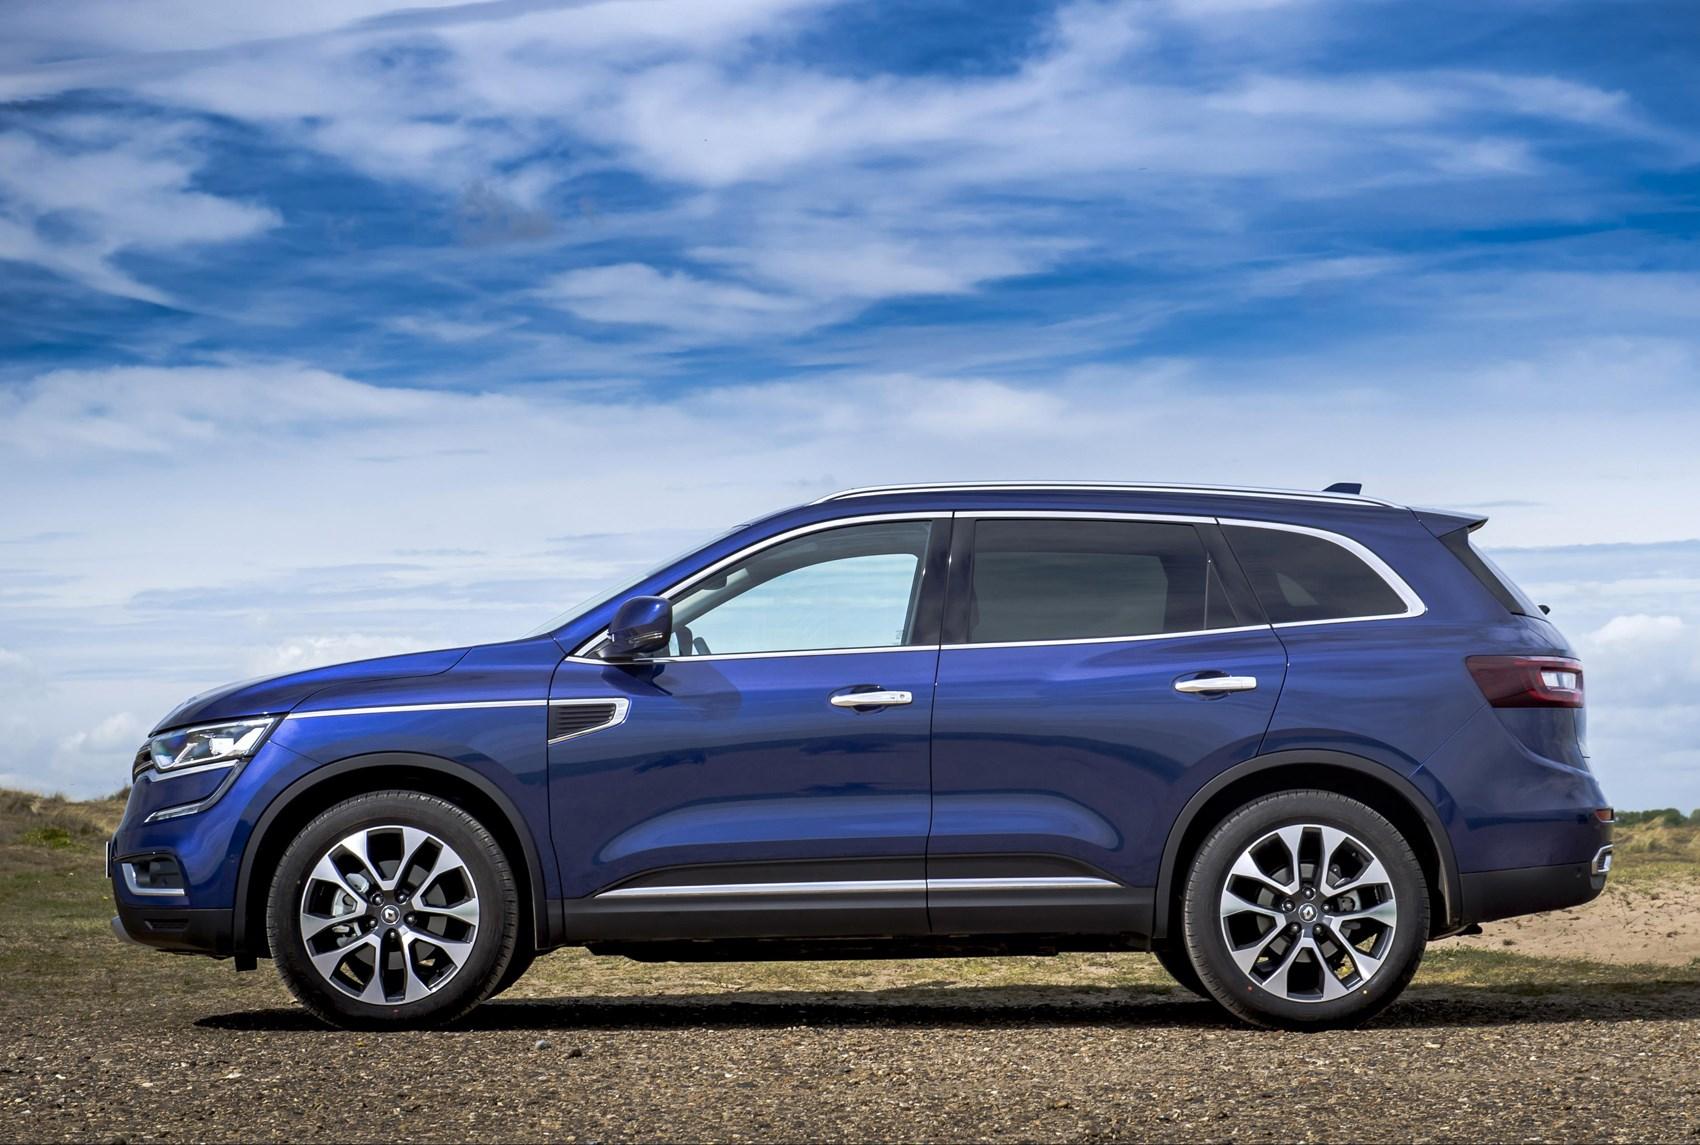 Renault Koleos SUV (2017 - ) Photos | Parkers